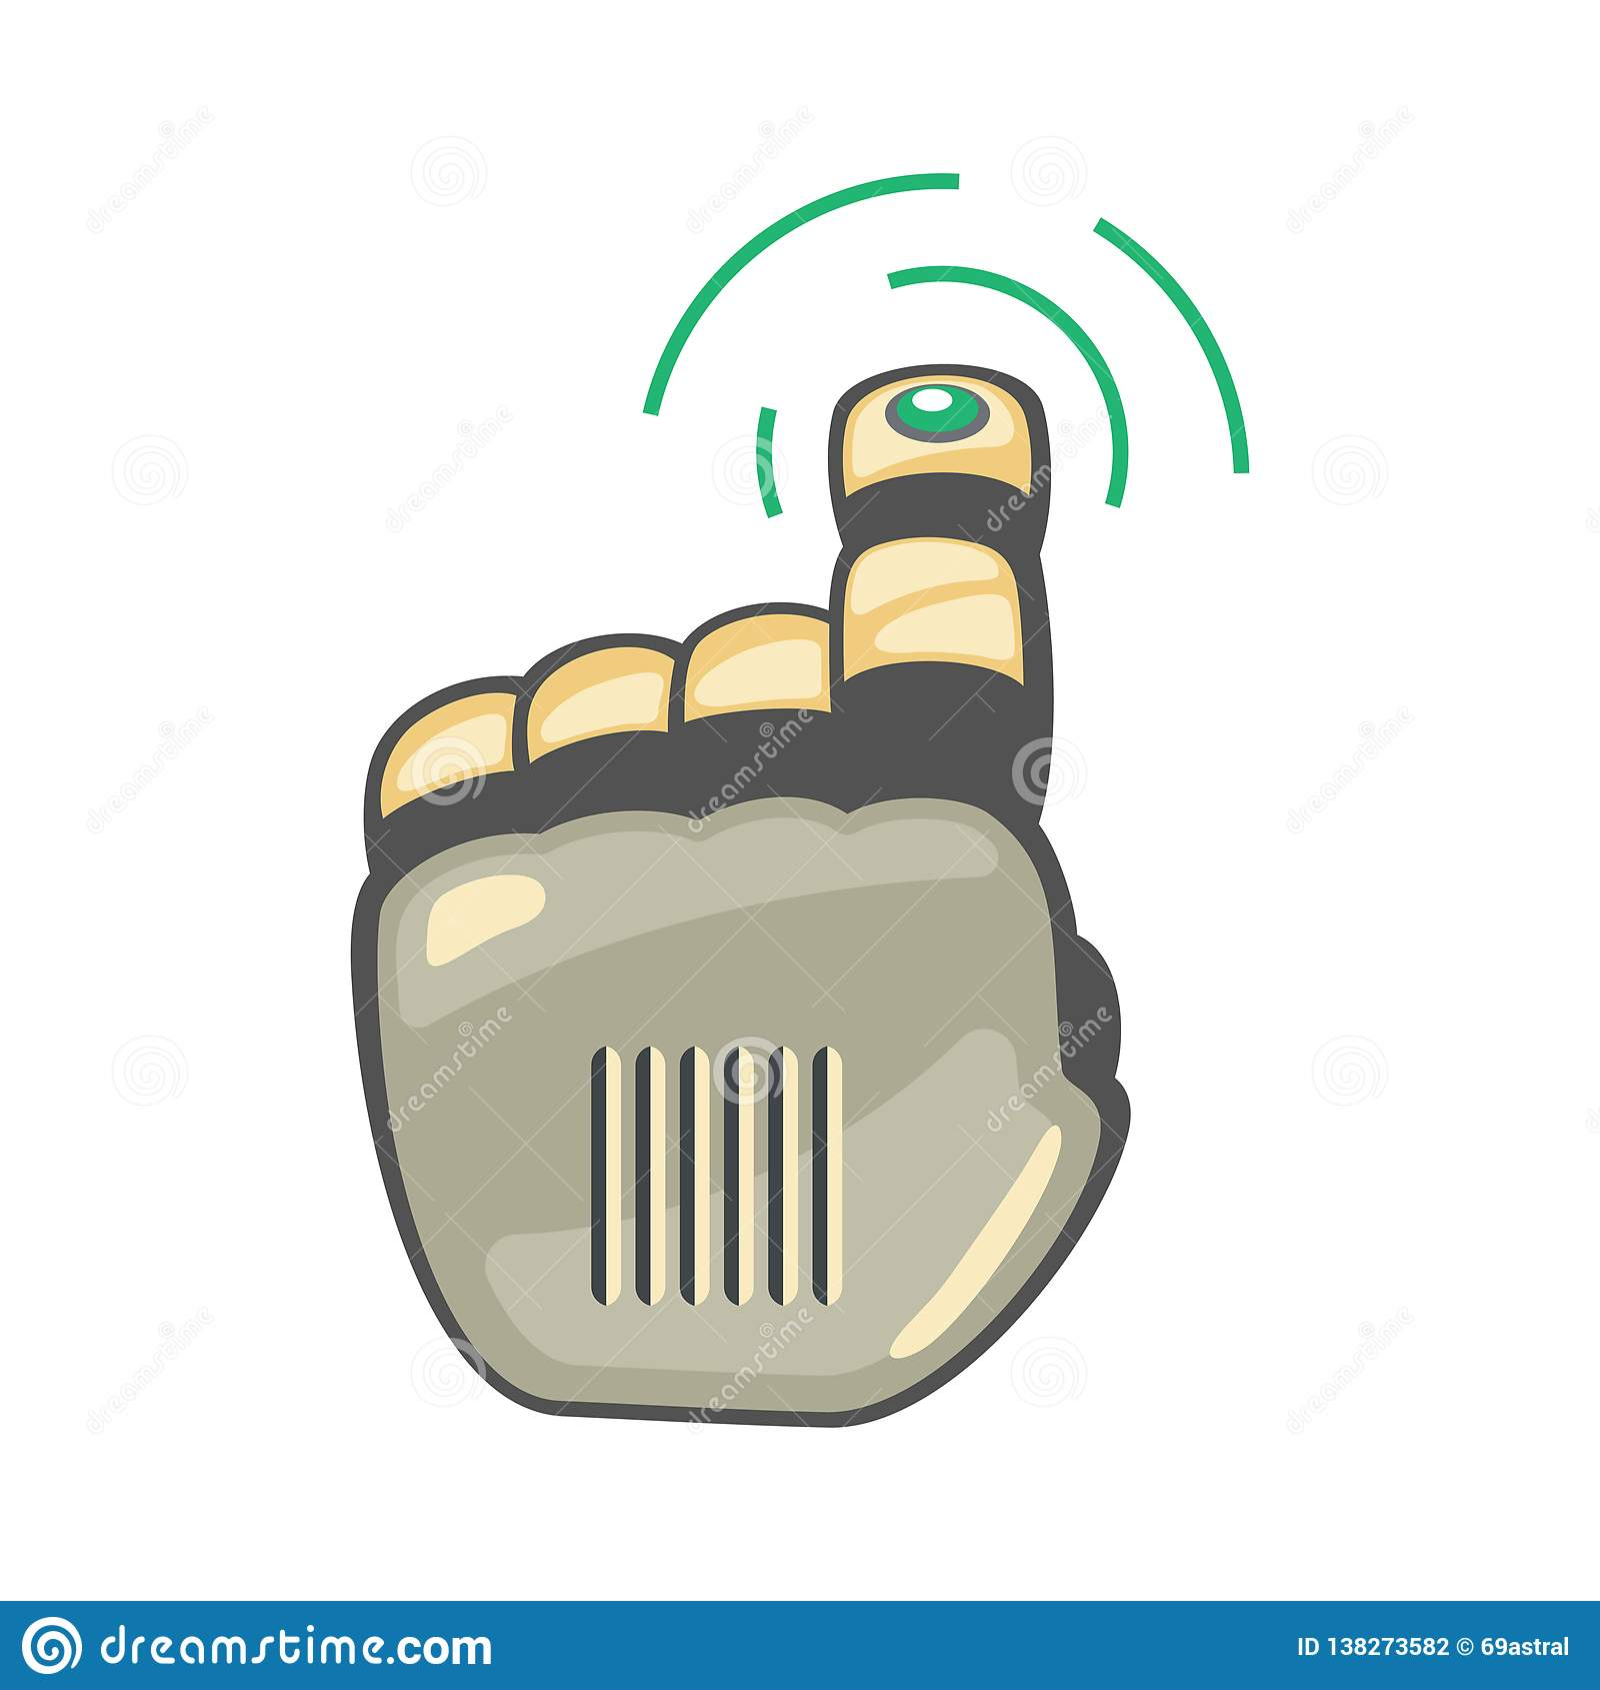 Robot hand. Mechanical technology machine engineering symbol. Hand gestures. Up. Pointer. Press sign. Futuristic design.